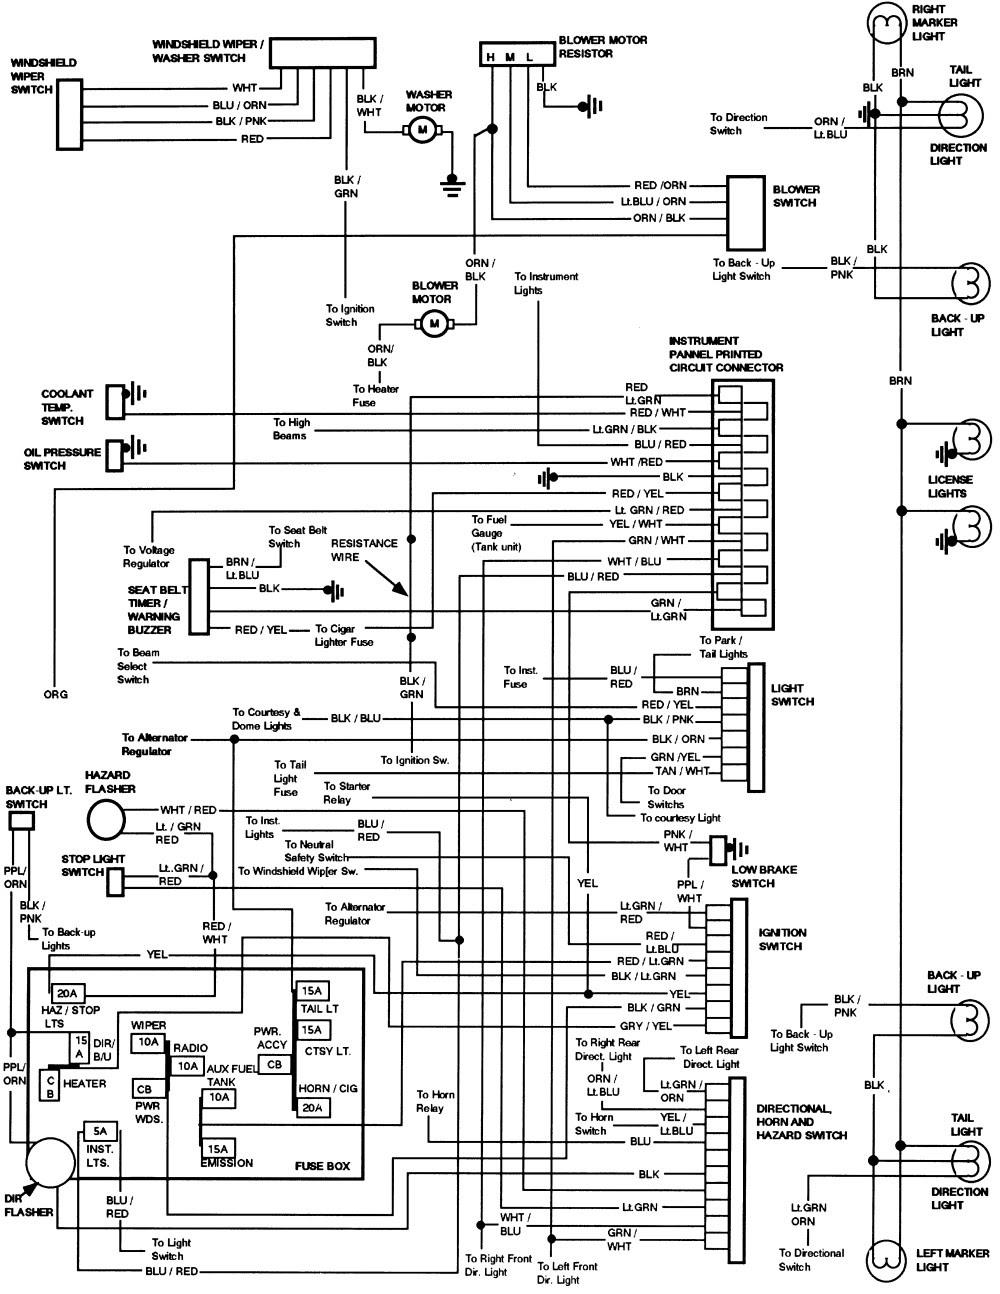 Diagram 78 Ford F 150 Steering Column Wiring Diagram Full Version Hd Quality Wiring Diagram Toro As4a Fr